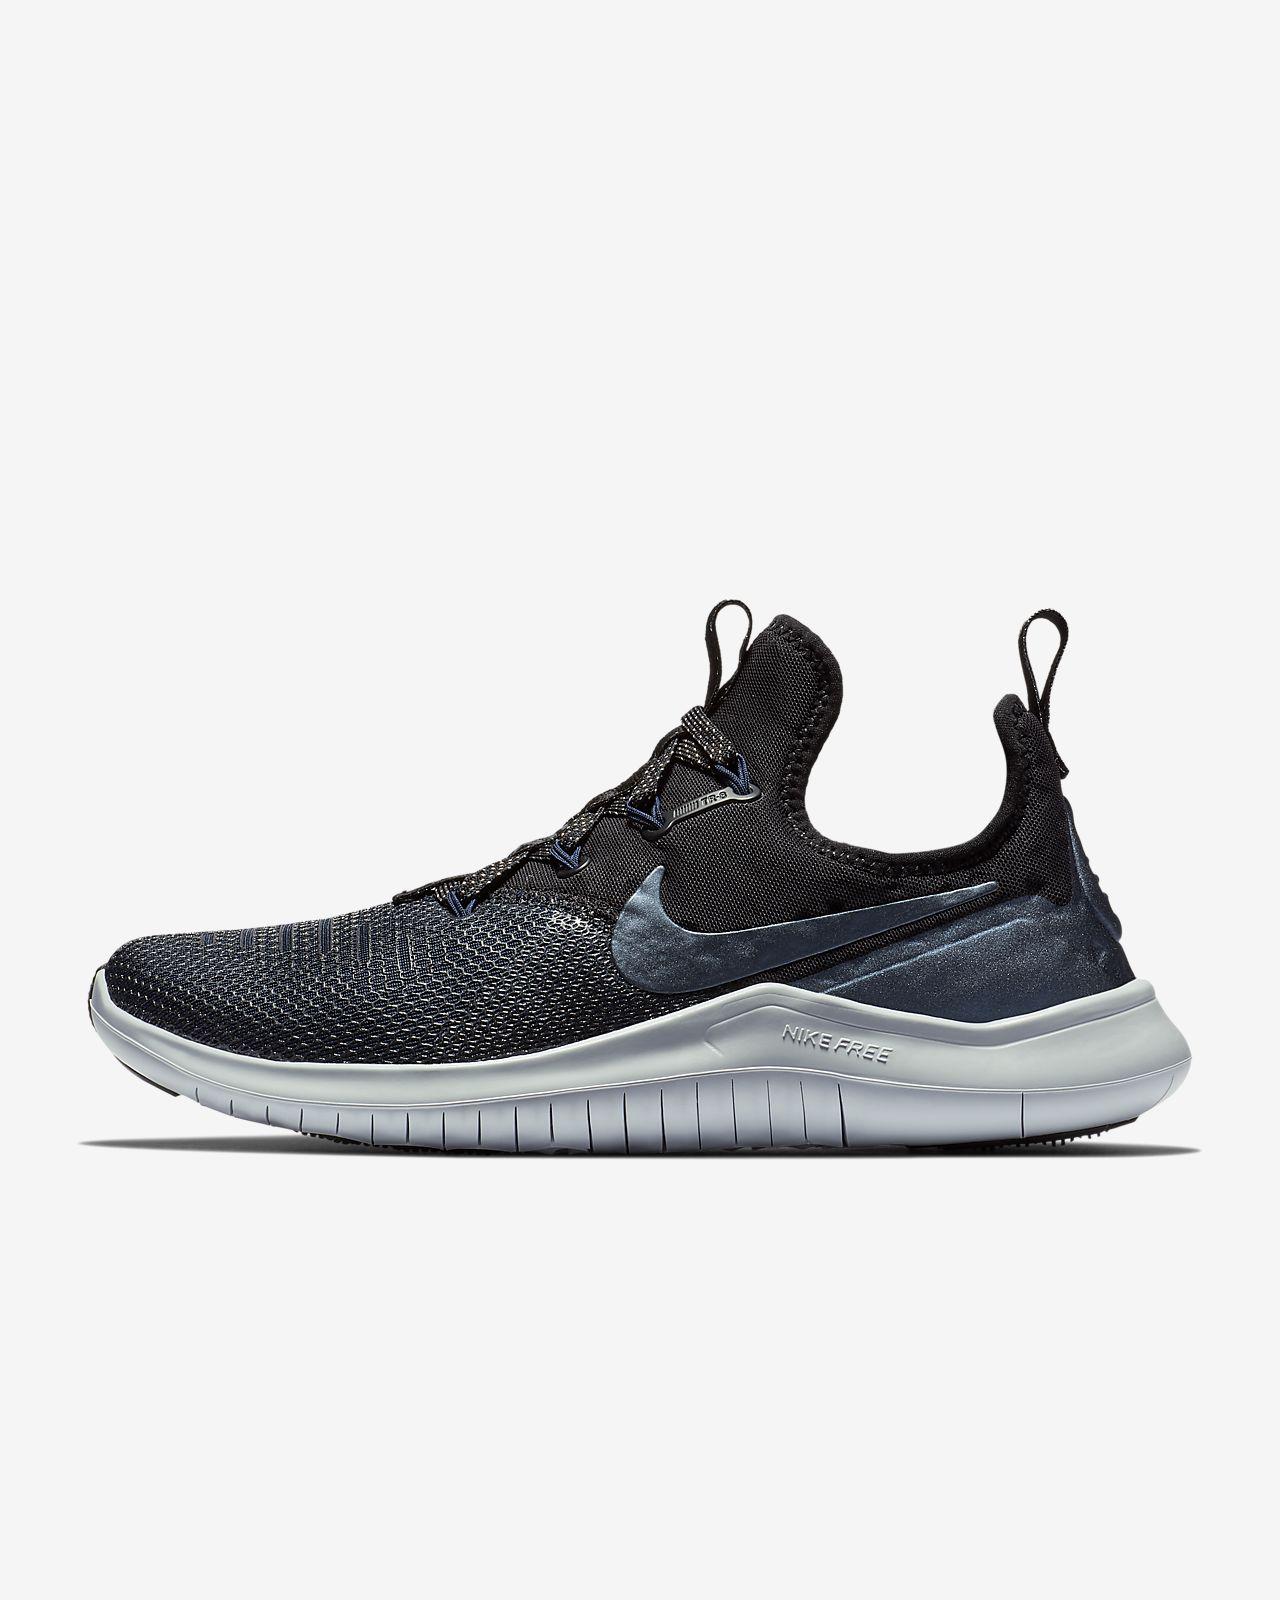 00efdd51b42d Nike Free TR 8 Metallic Women s Training Shoe. Nike.com IE